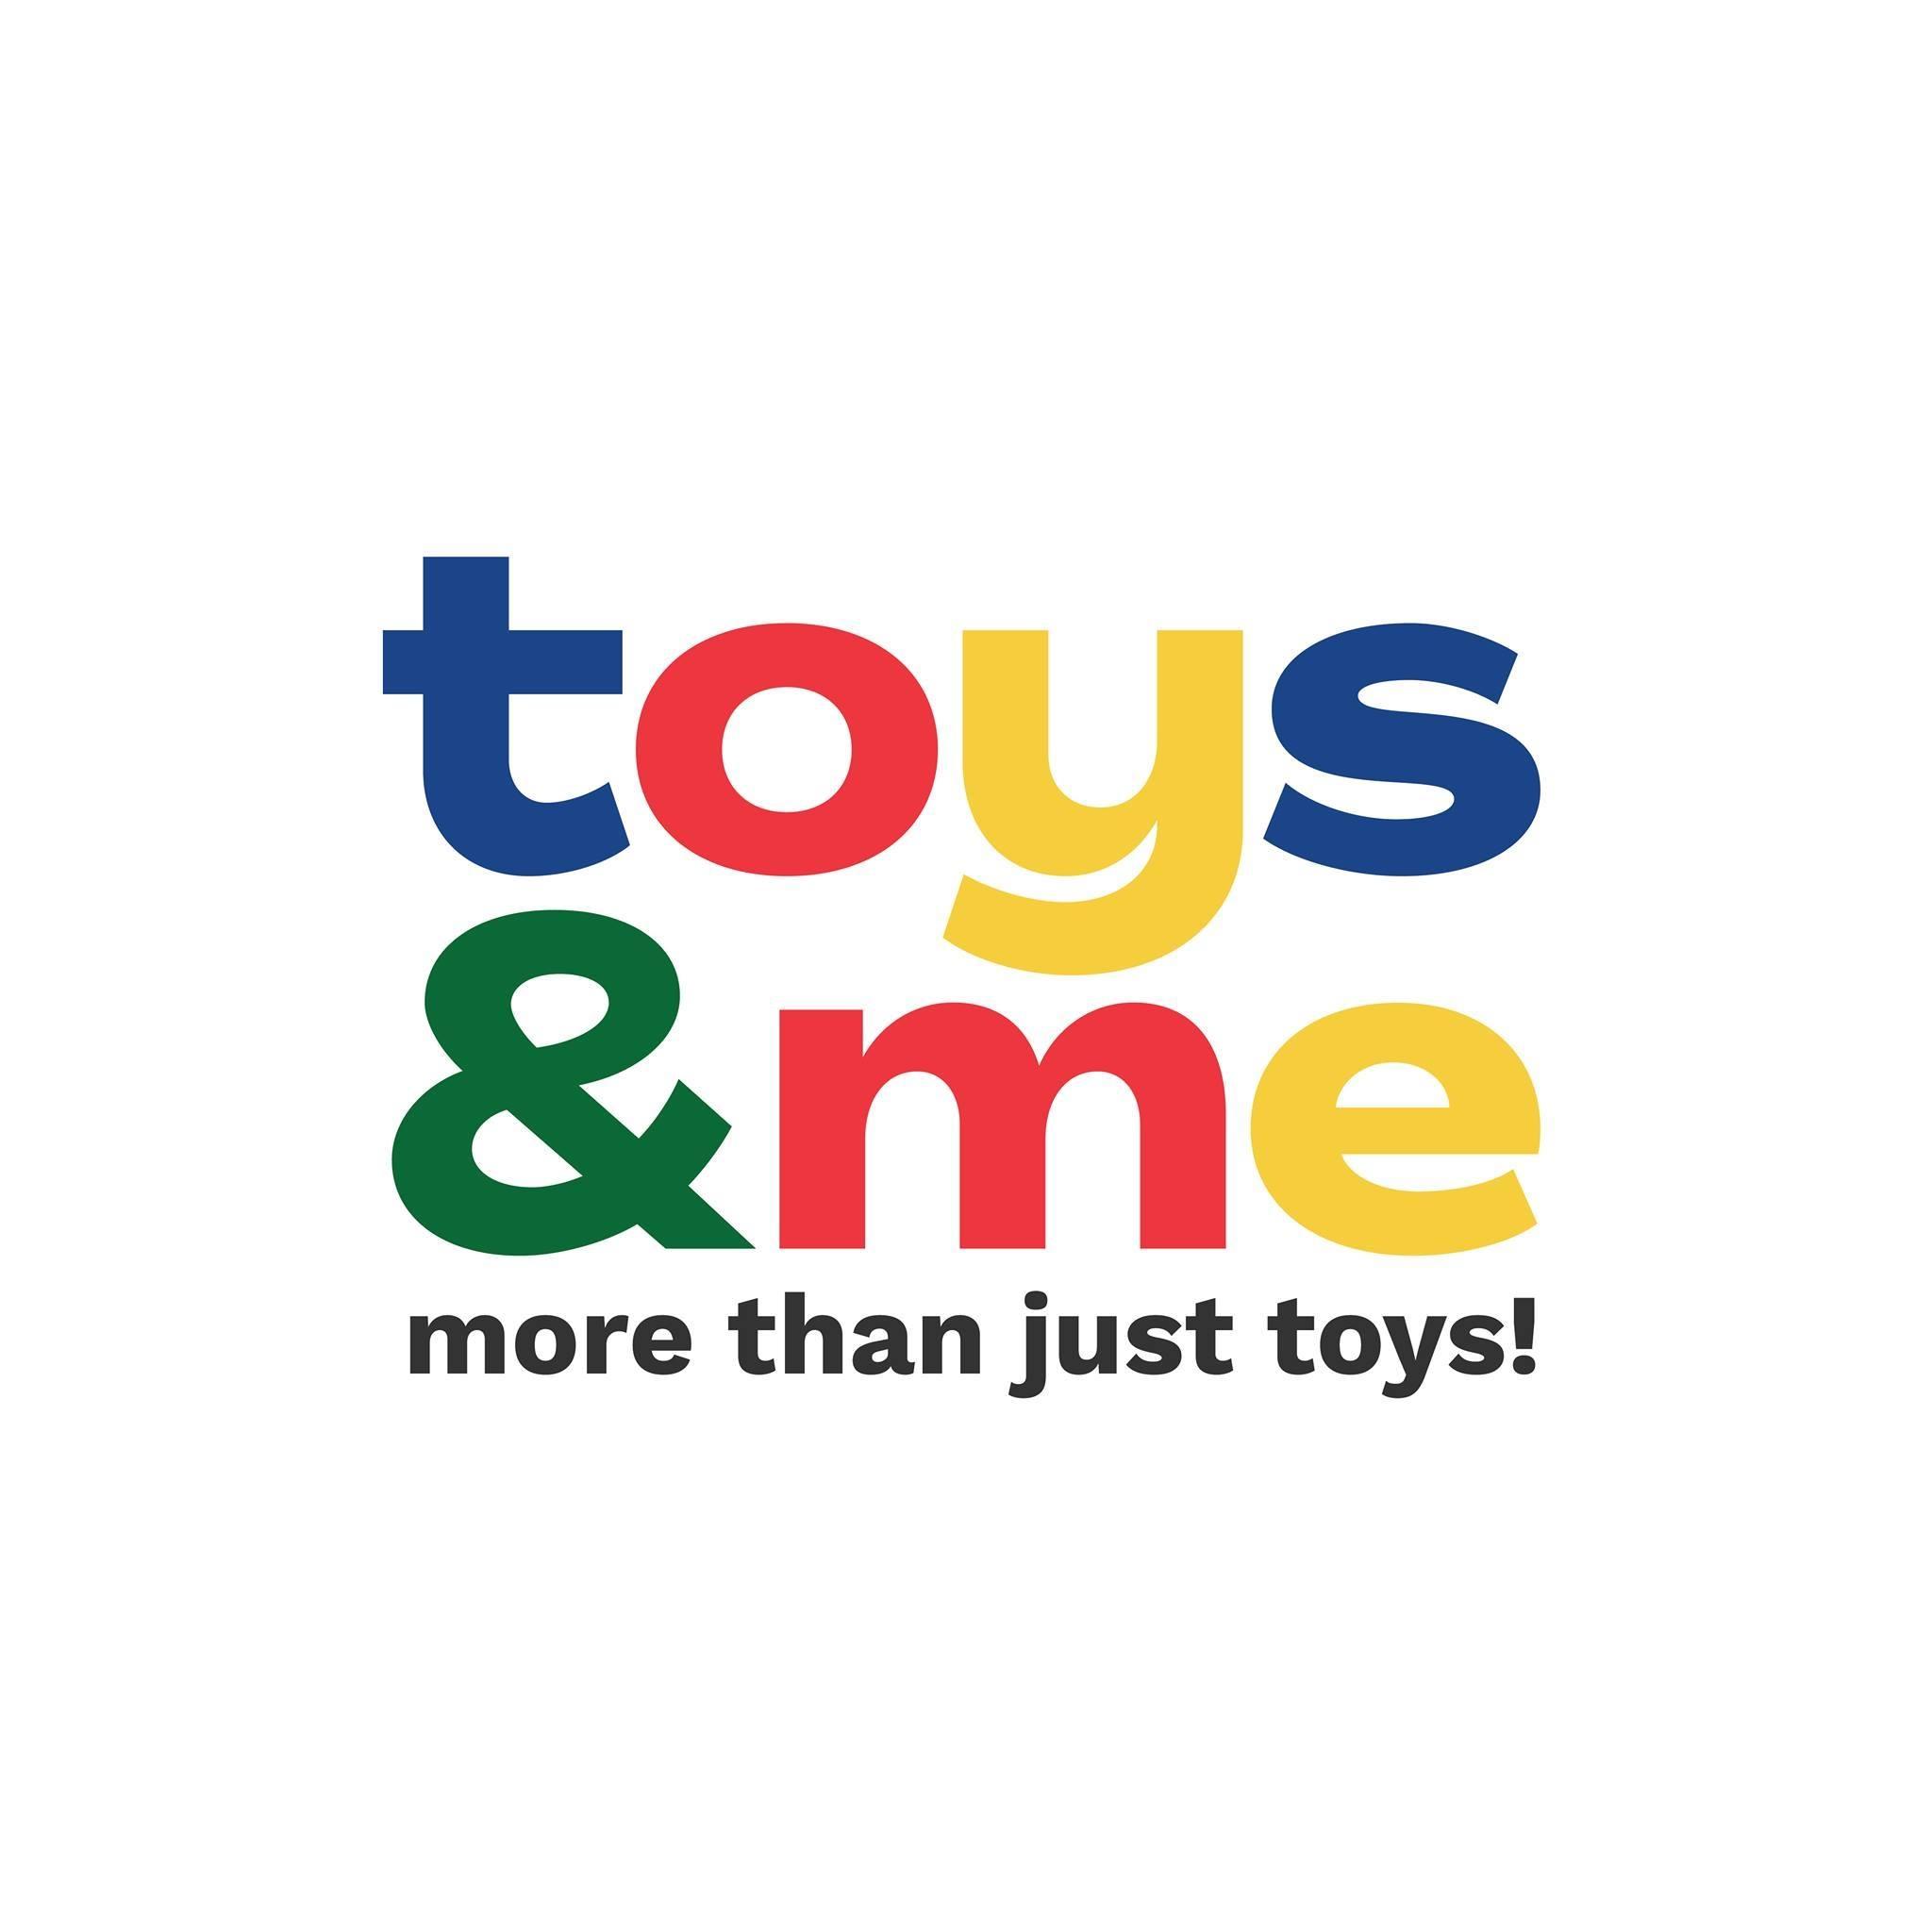 https://hrincjobs-pro.s3.amazonaws.com/media/public/filer_public/eb/16/eb161c3a-e44d-4a72-8f91-ad69aa675871/toys.jpg